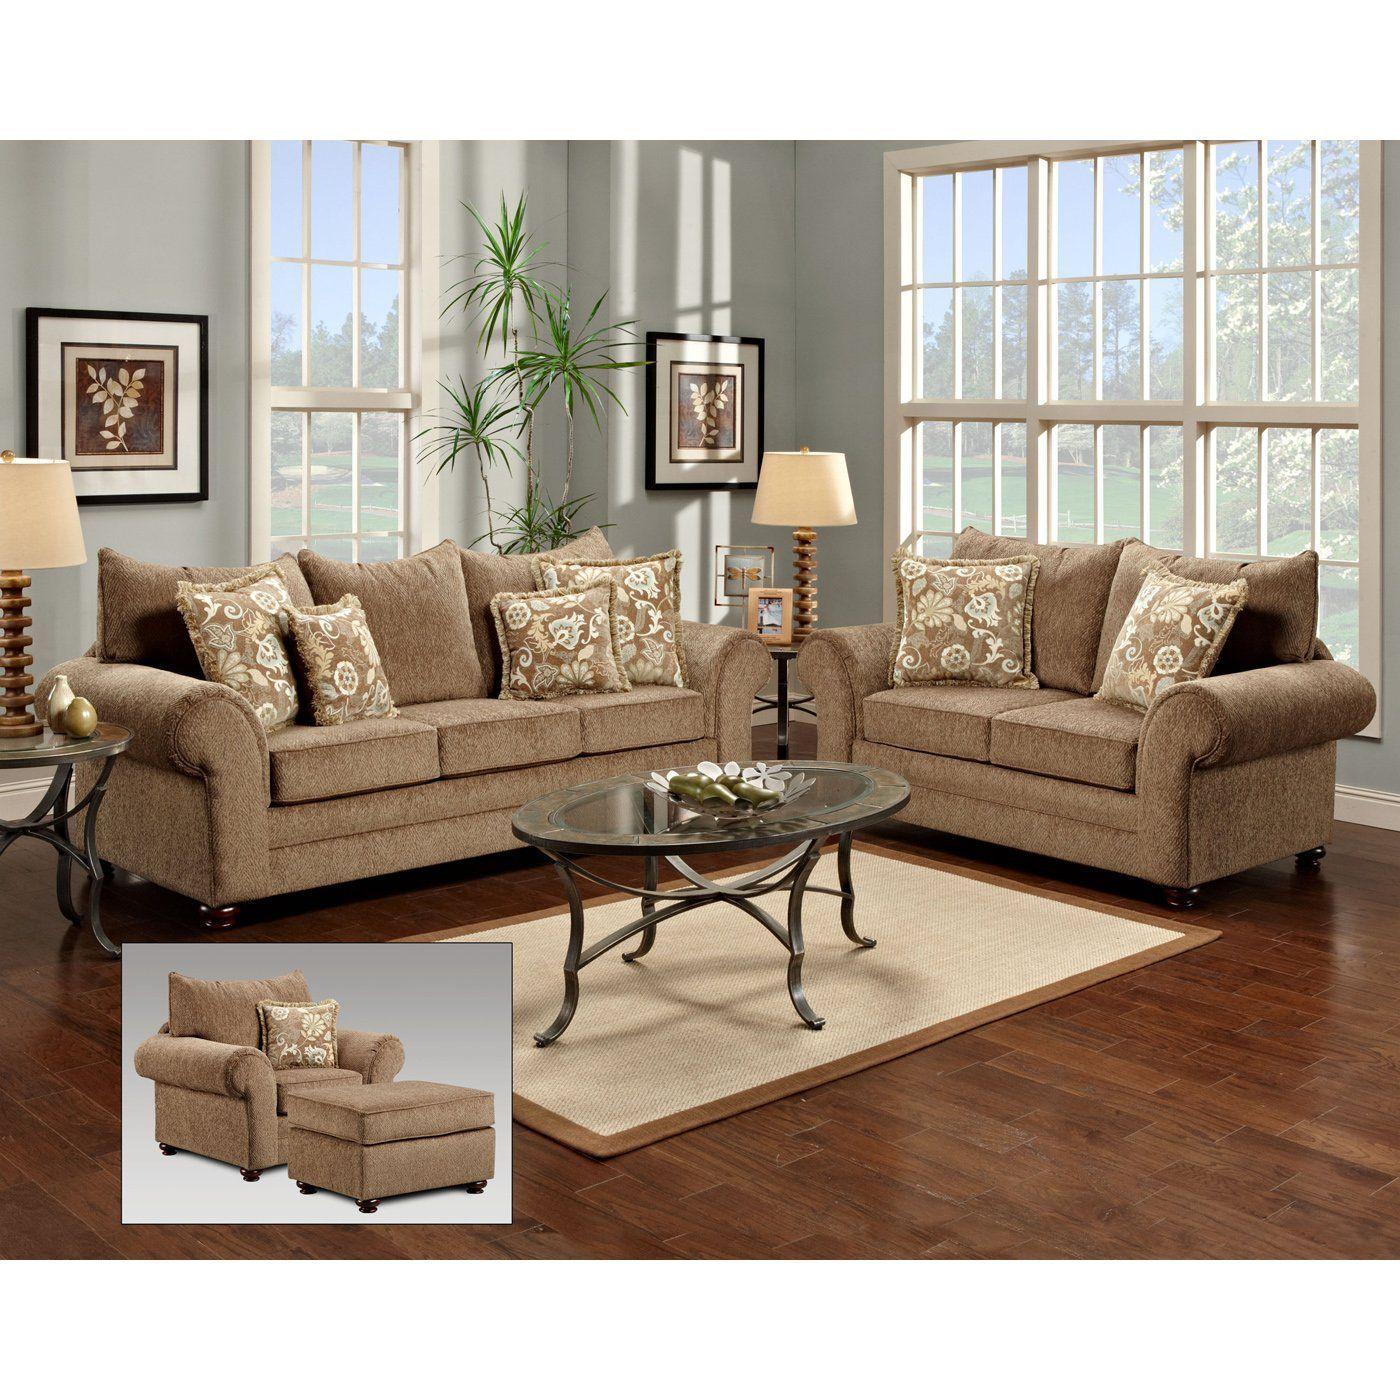 Sofa, loveseat, chair and ottoman.